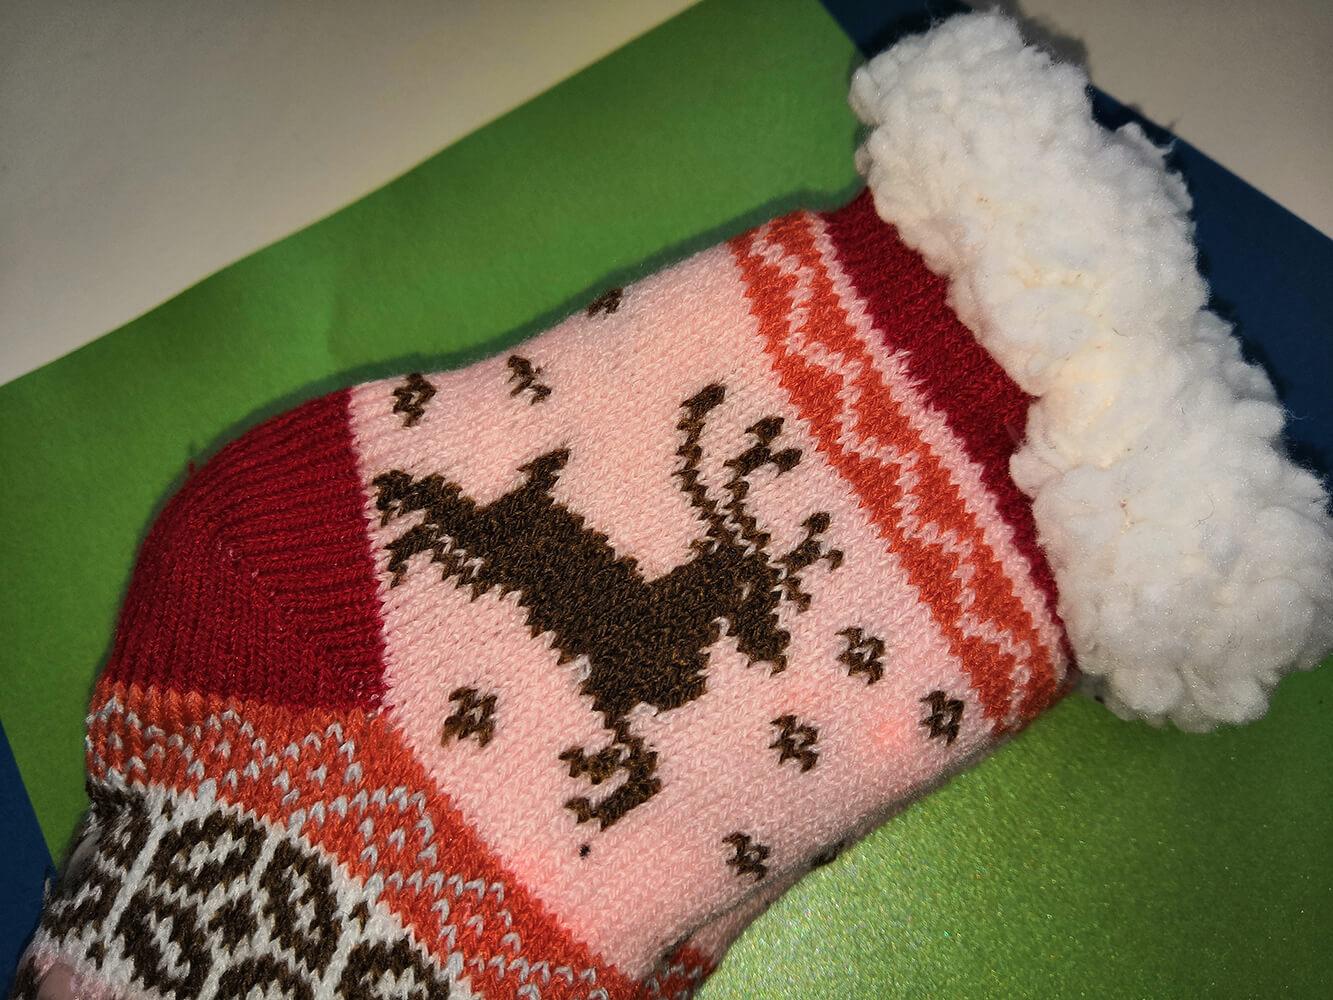 Детские носки-тапочки Emi Ross EJ-6208-r красного цвета. 32-35 размера. Фото 2